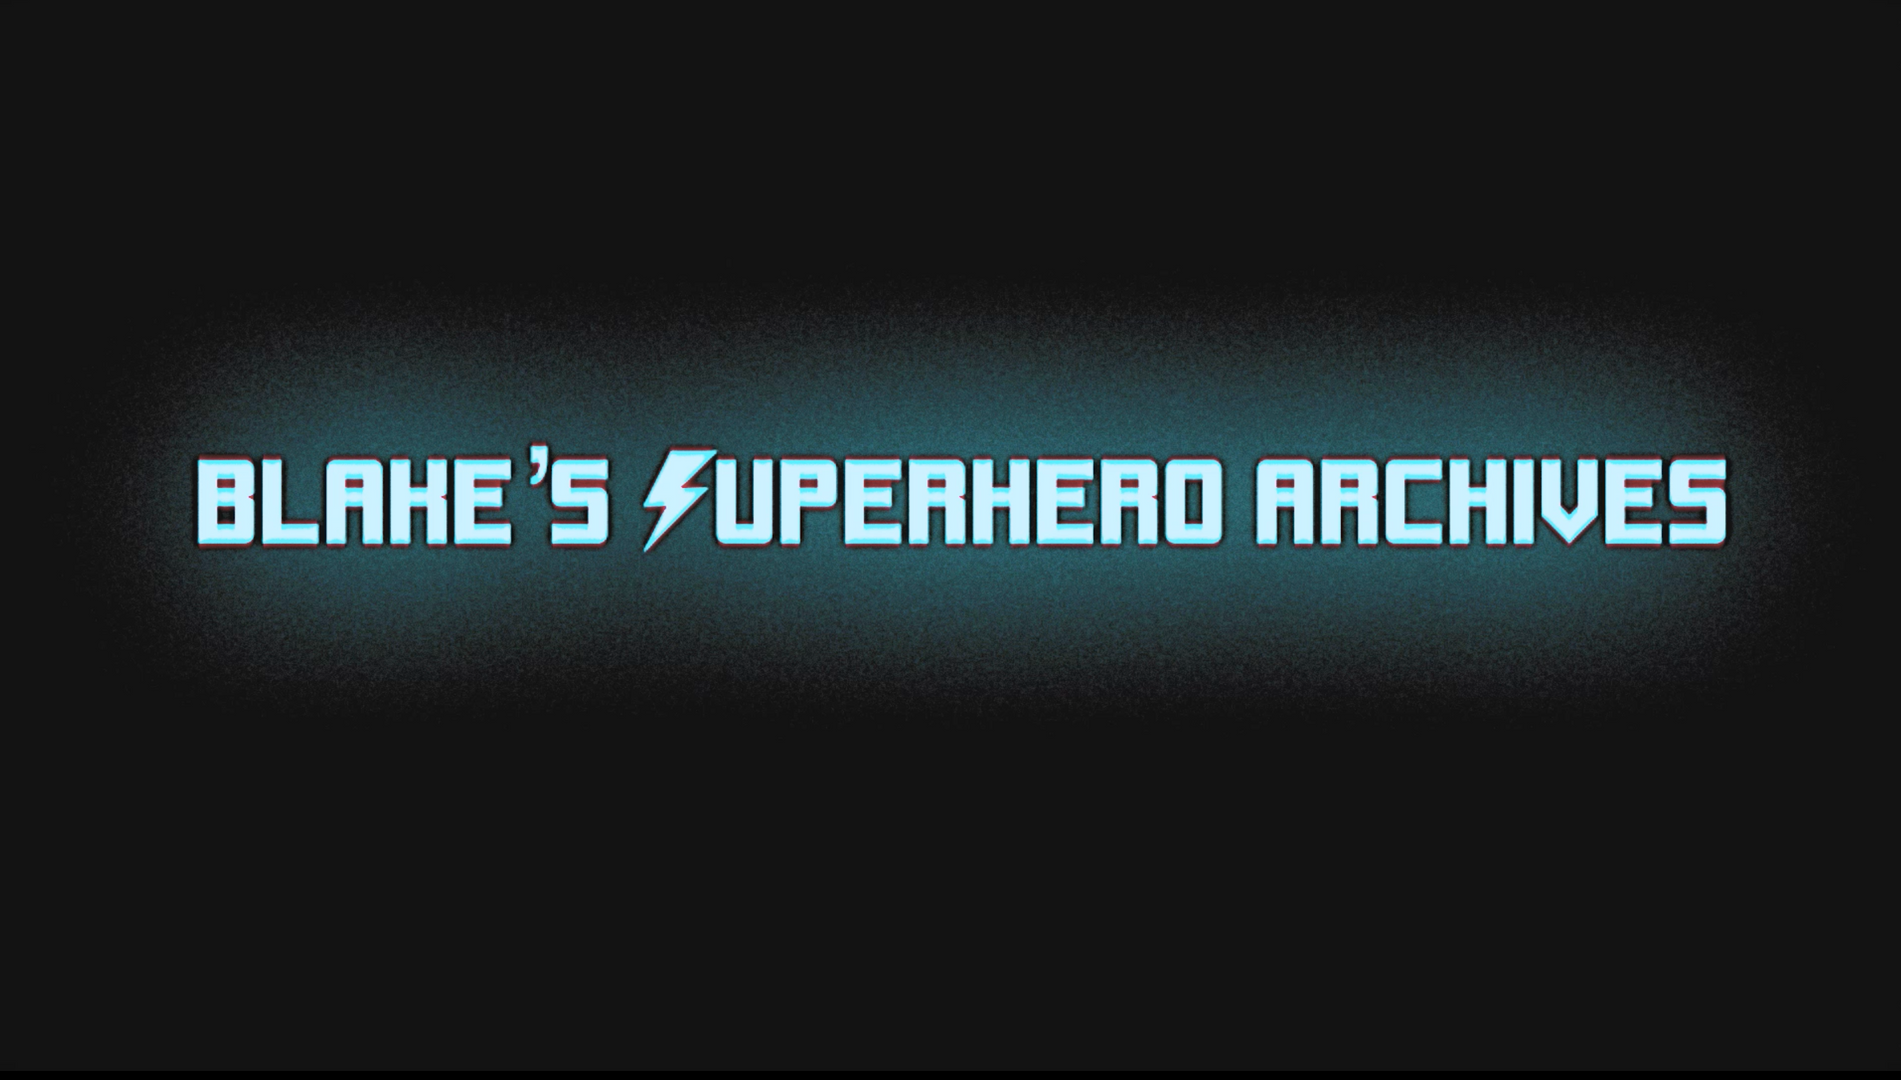 Blake's Superhero Archives Title